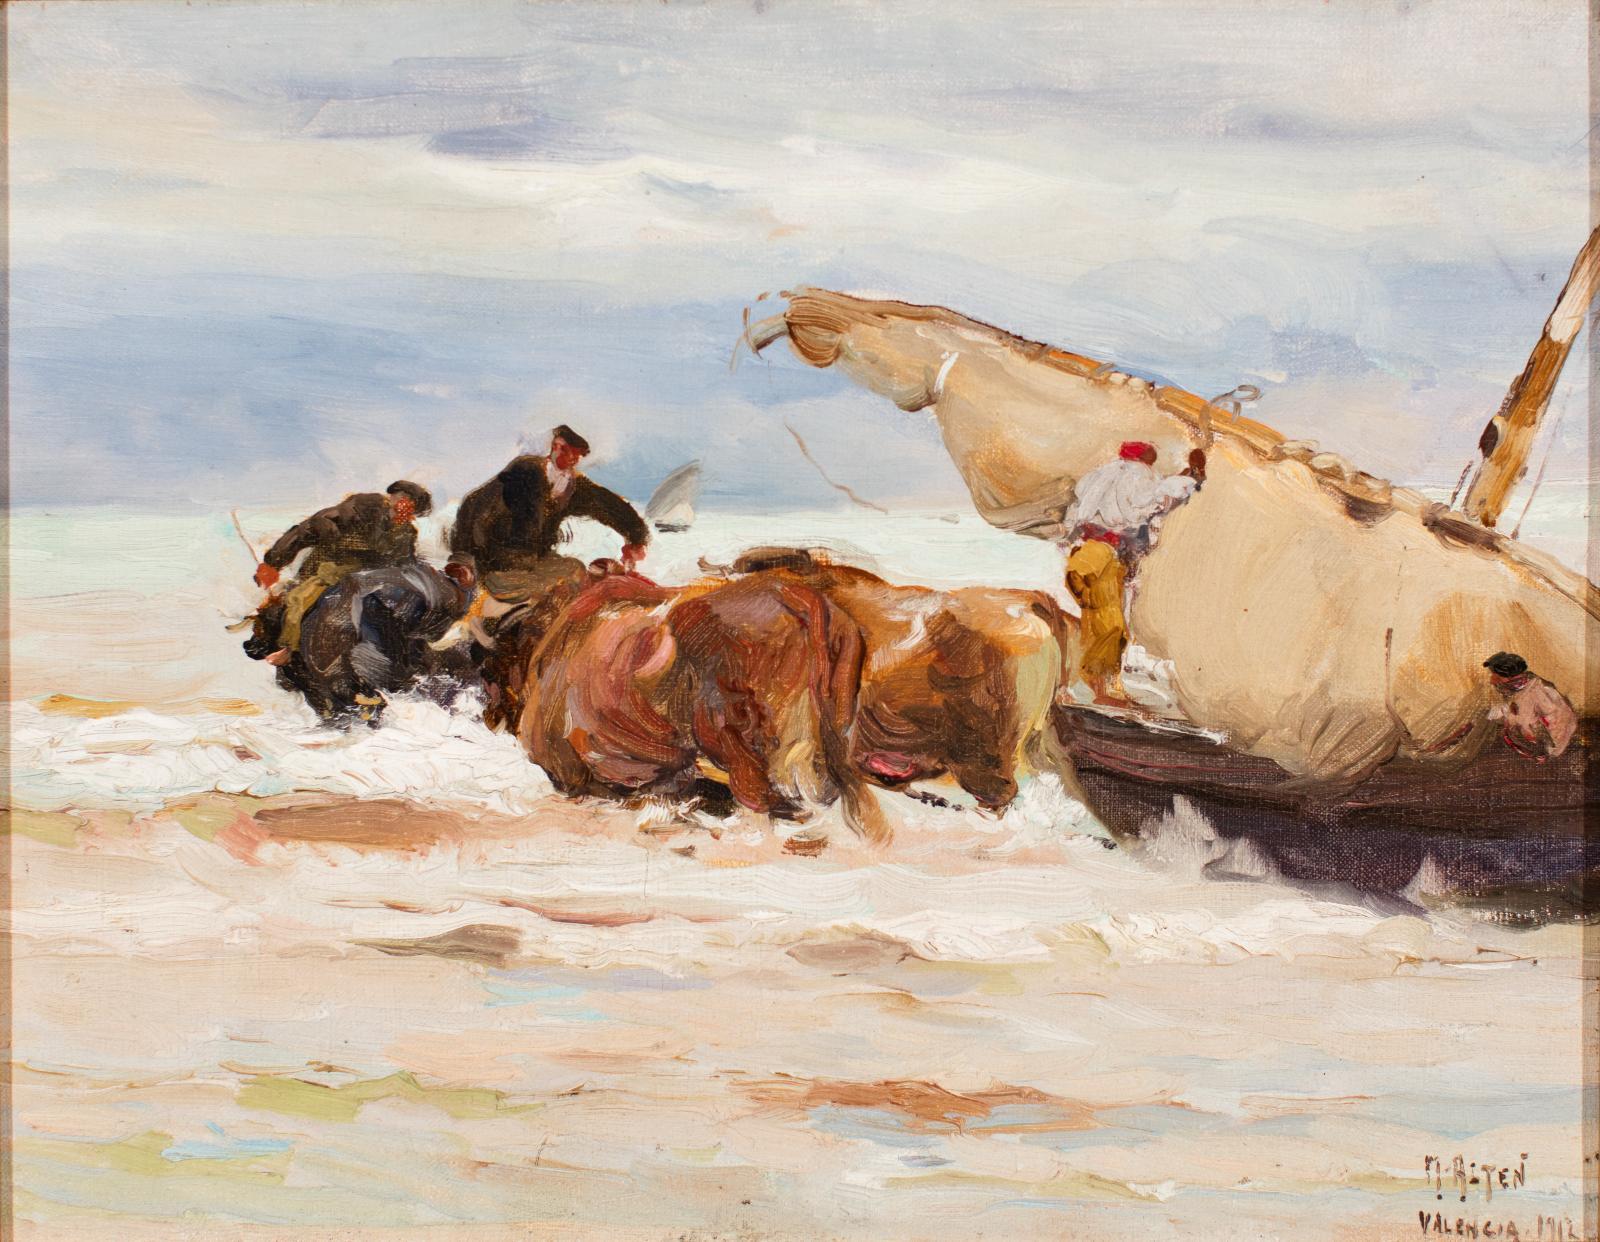 Seascape oil painting.